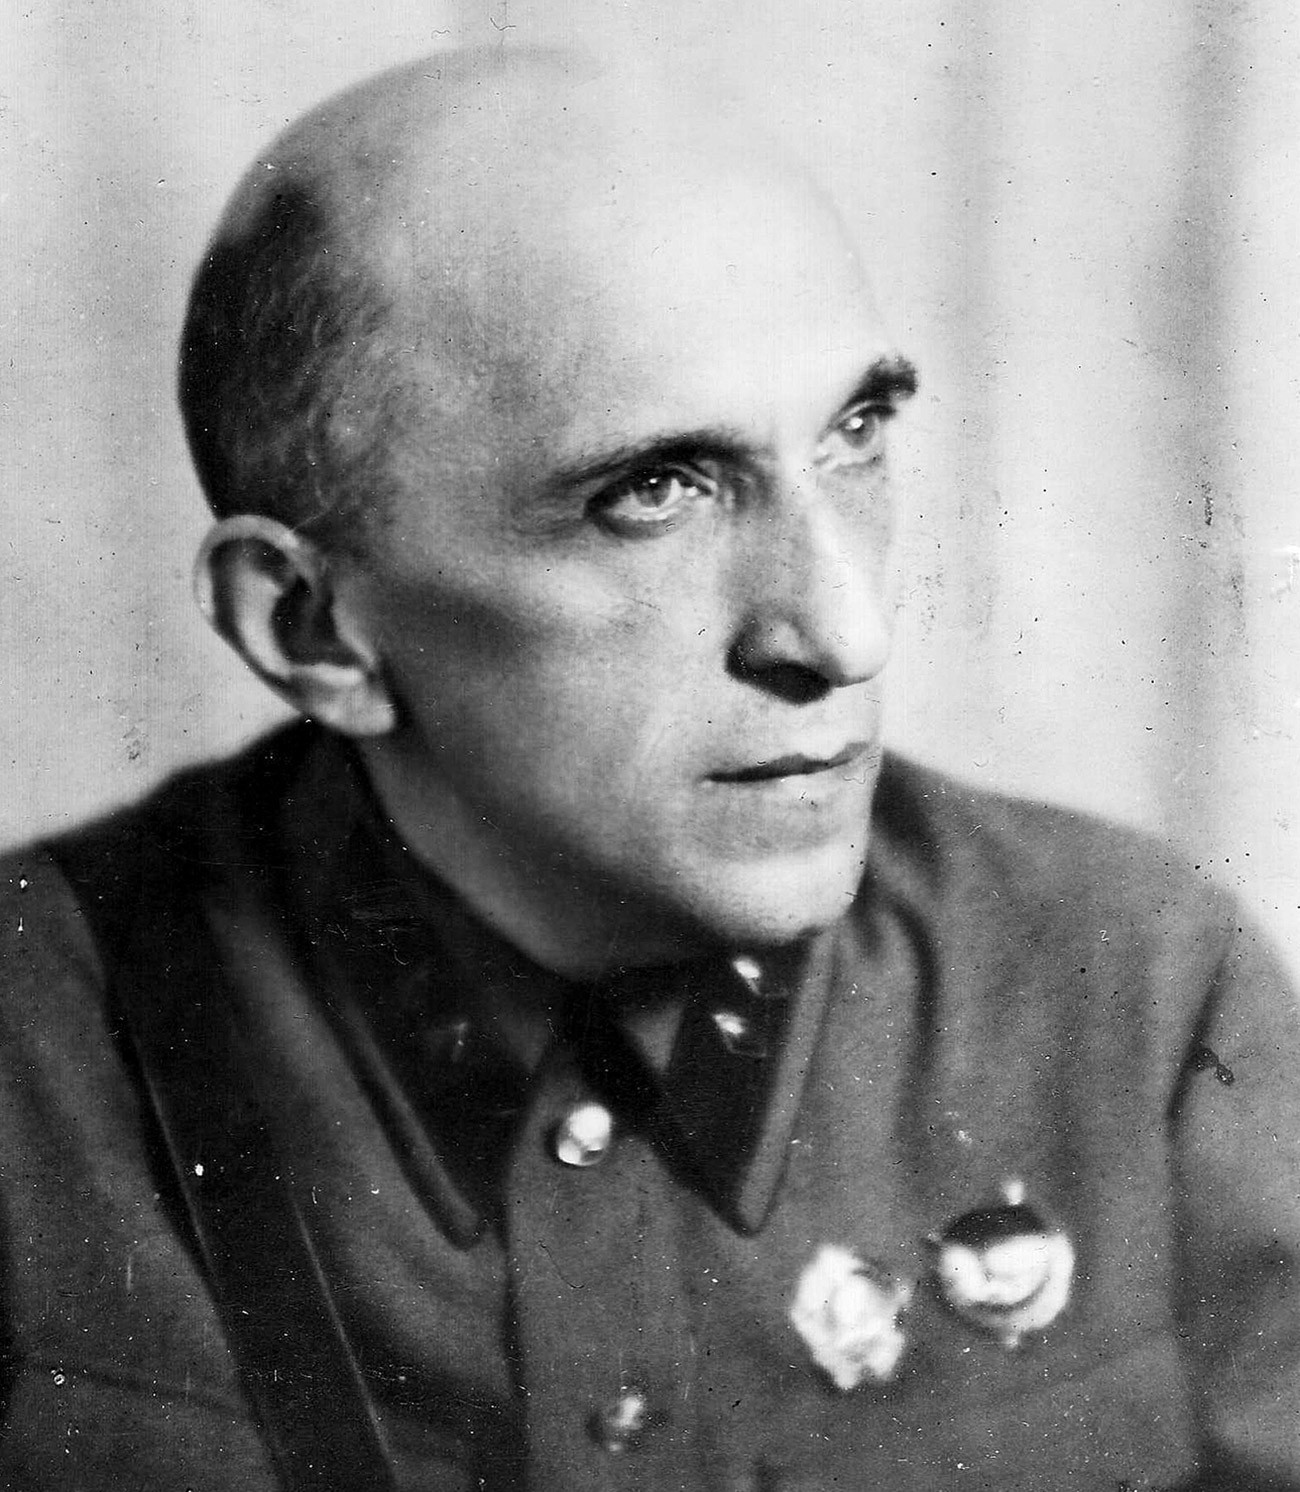 Jakow Serebrjanski im Jahr 1941